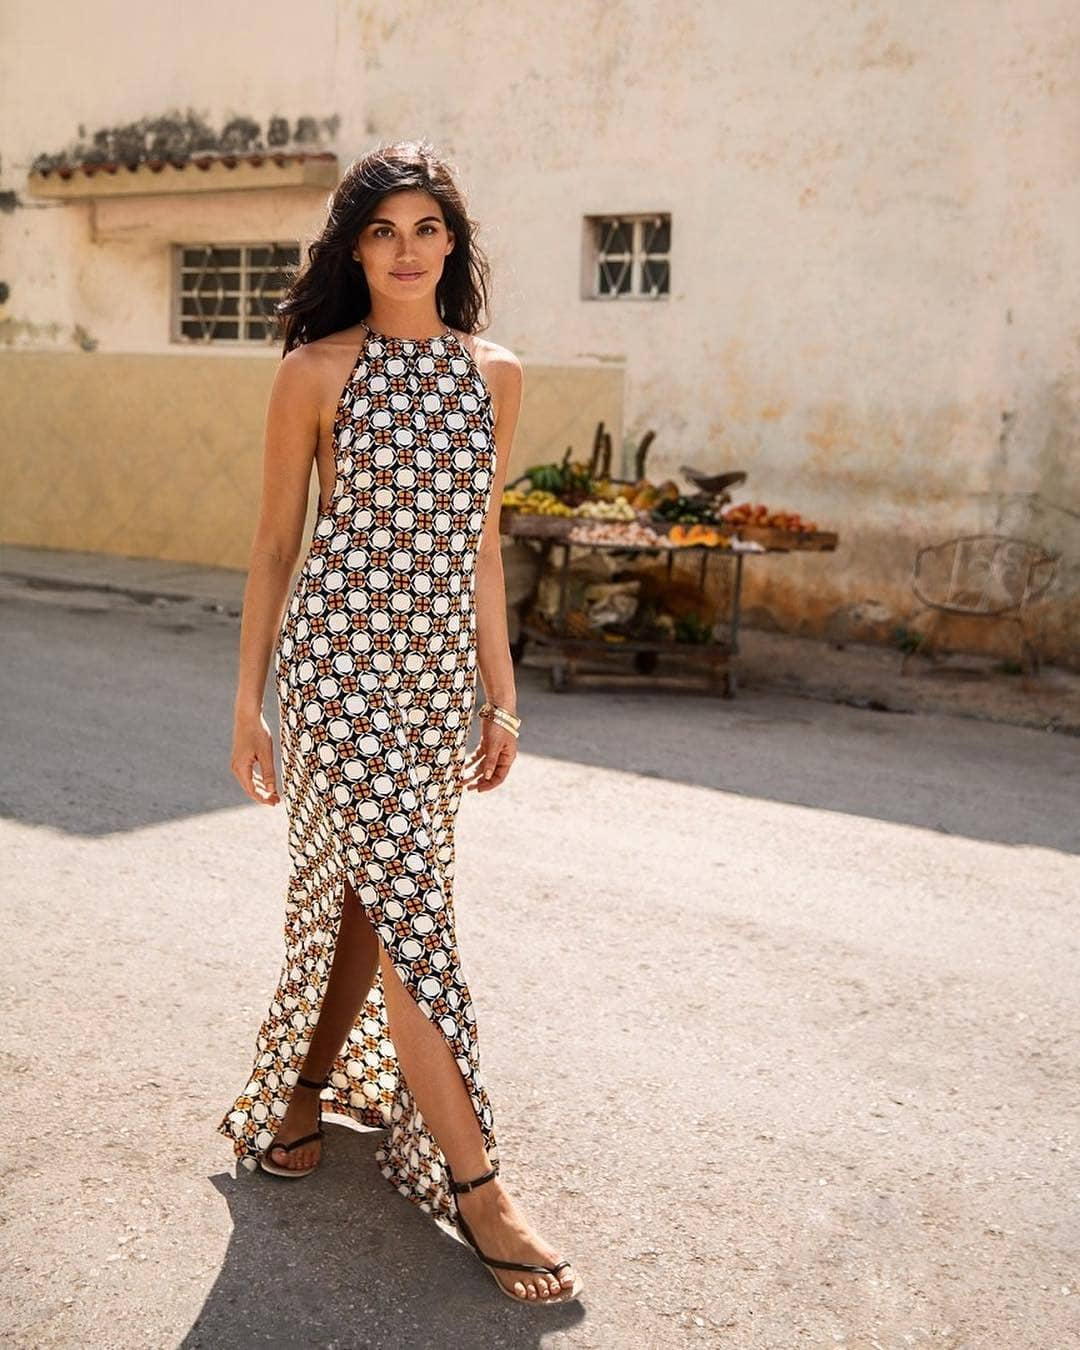 O-Neck Bold Print Sleek And Stylish Maxi Dress